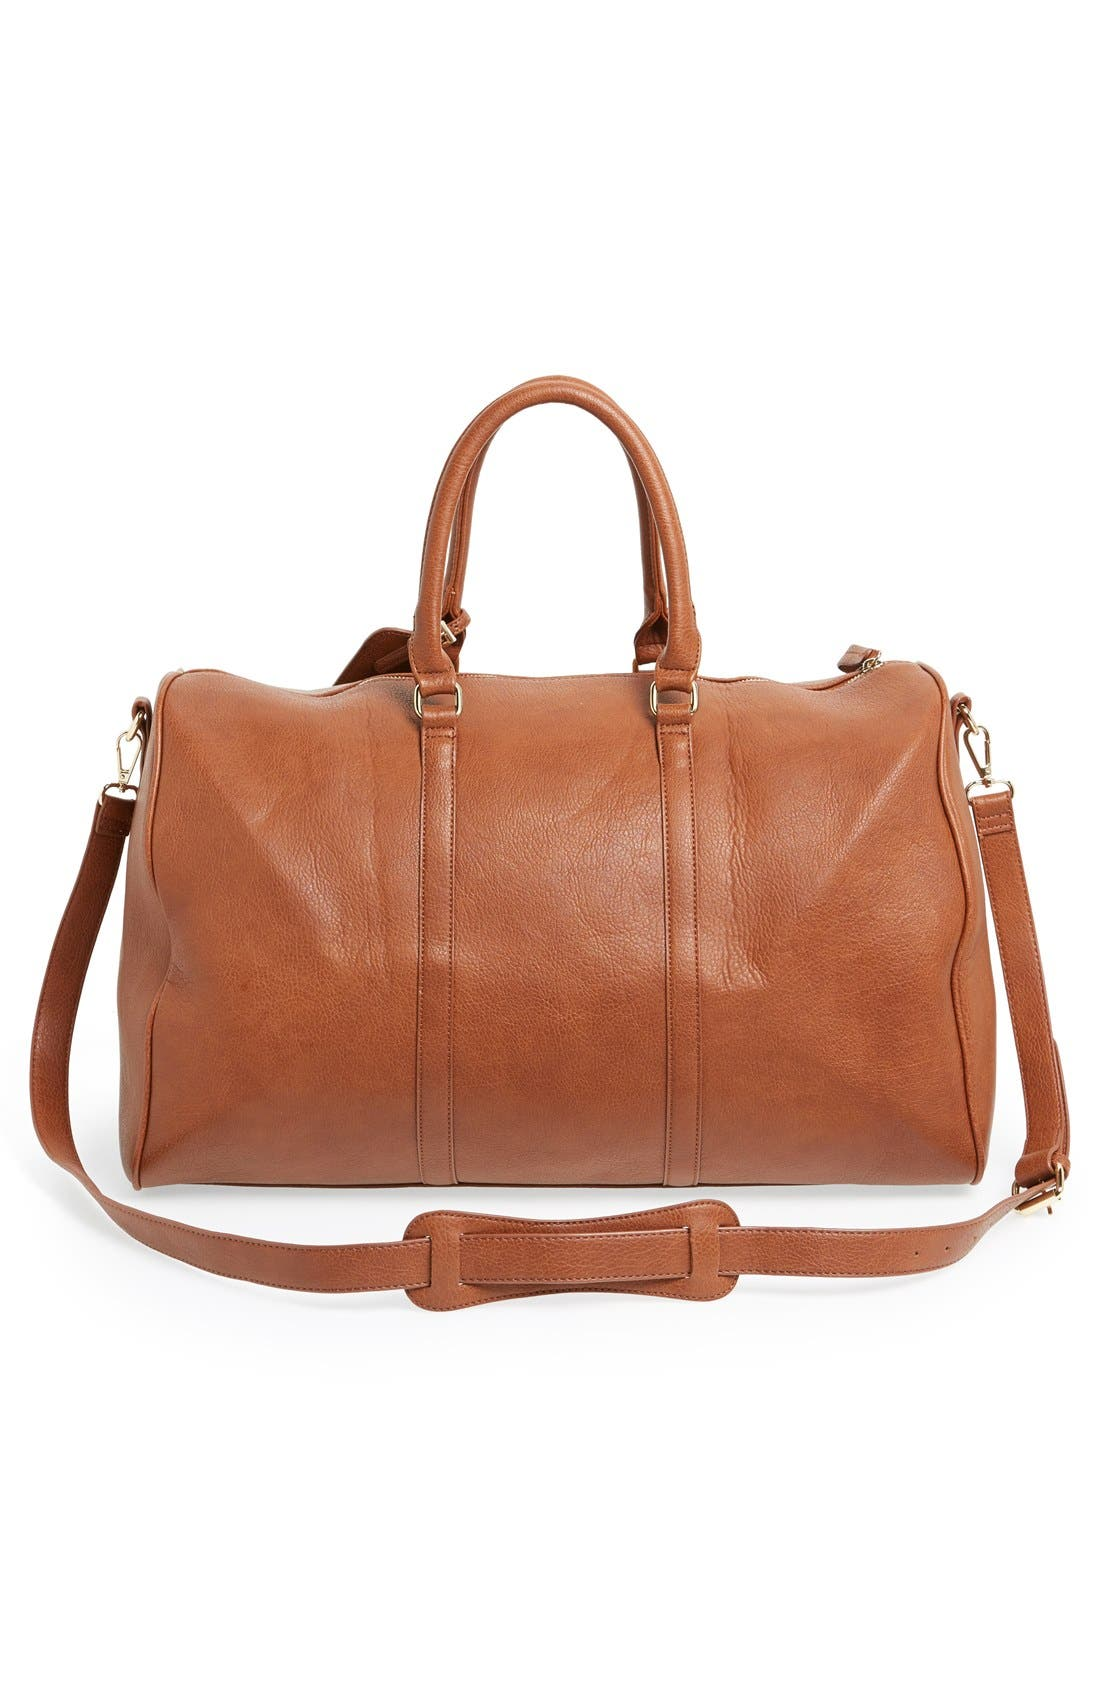 'Lacie' Faux Leather Duffel Bag,                             Alternate thumbnail 3, color,                             BROWN